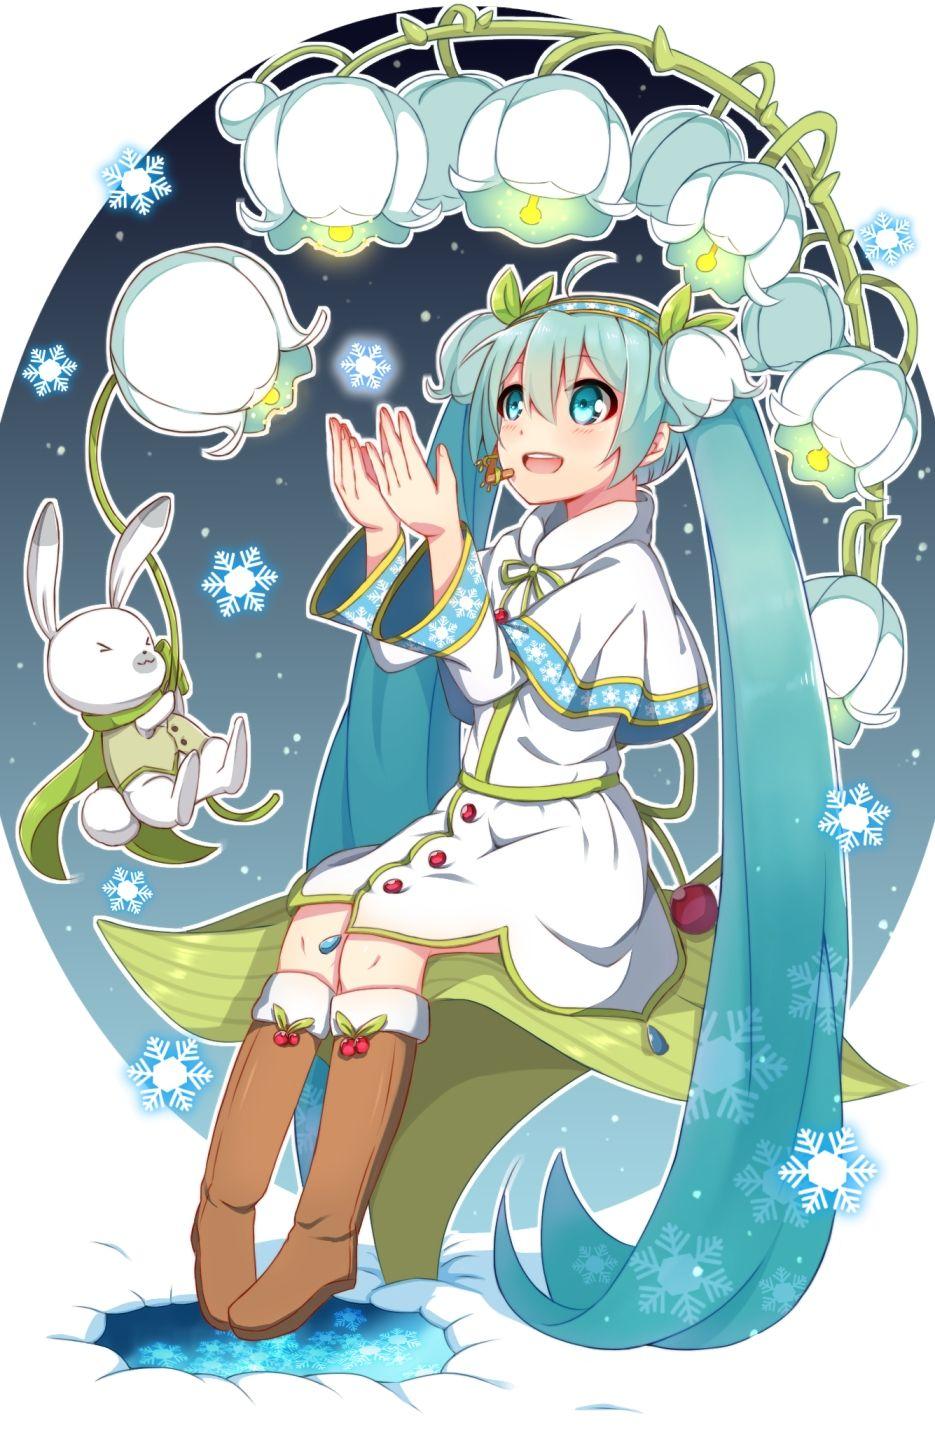 Yuki Miku (Lily Of The Valley) Vocaloid, Hatsune miku, Miku